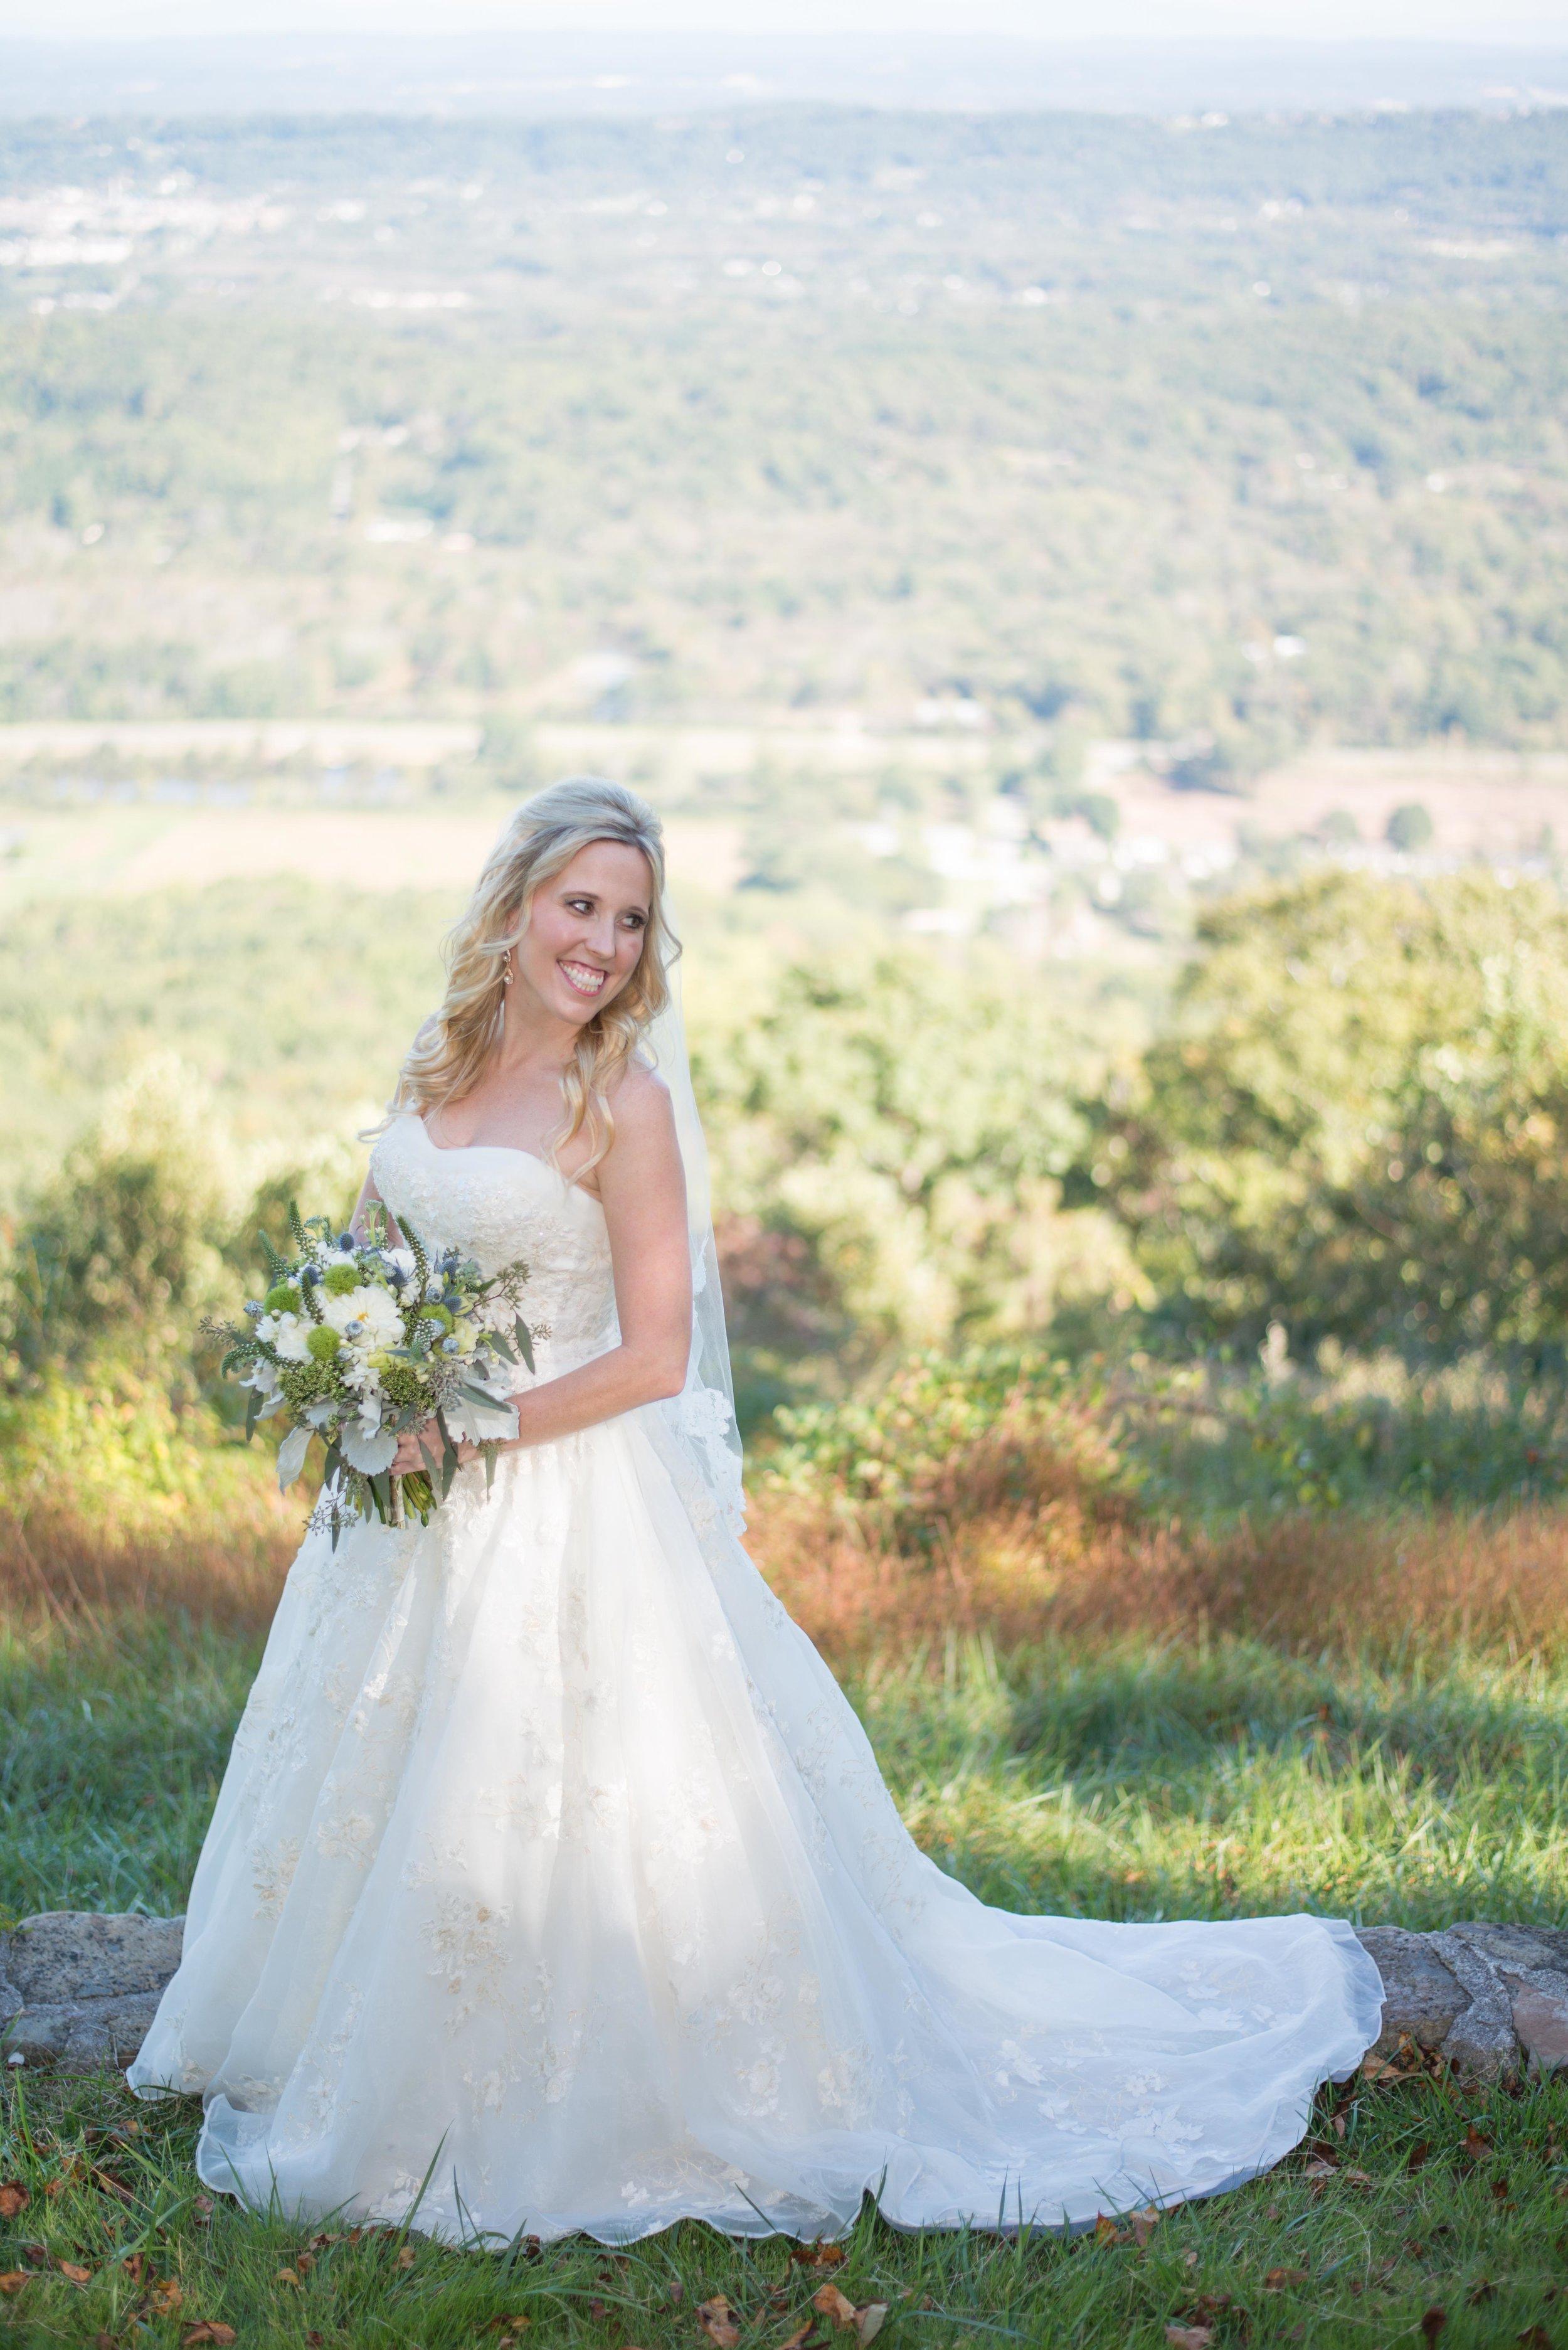 00001_Kuhnert-Wedding-18.jpg